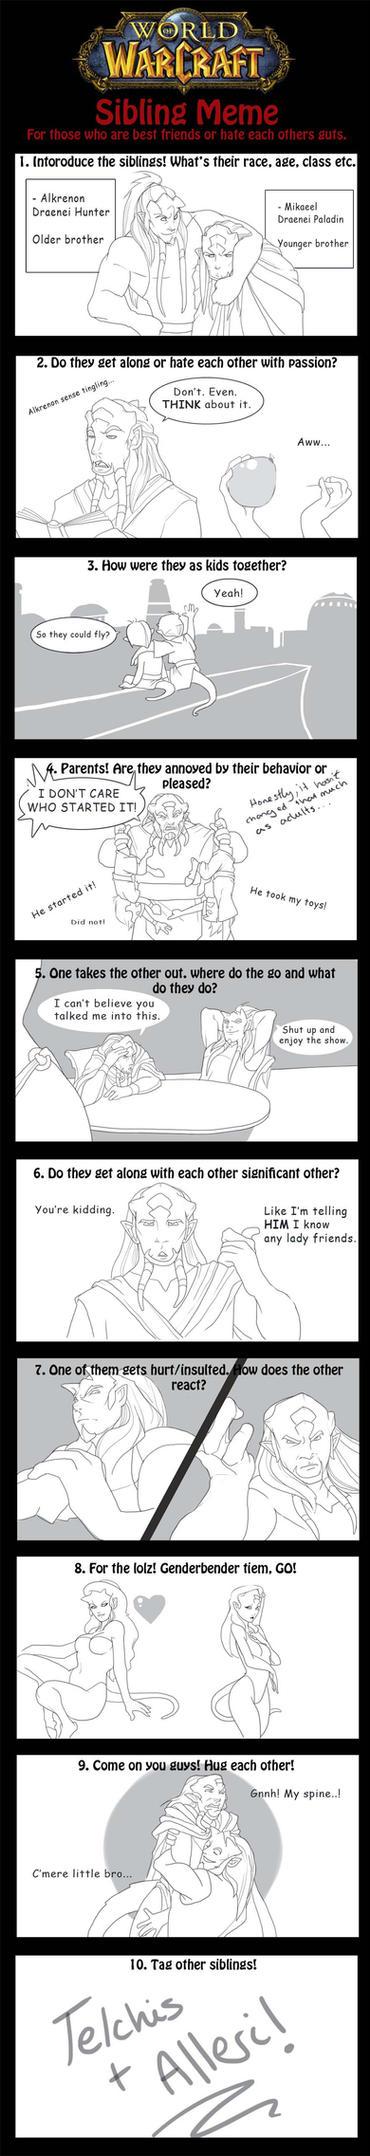 Warcraft Sibling Meme - Alkrenon and Mikaeel by Iseijin